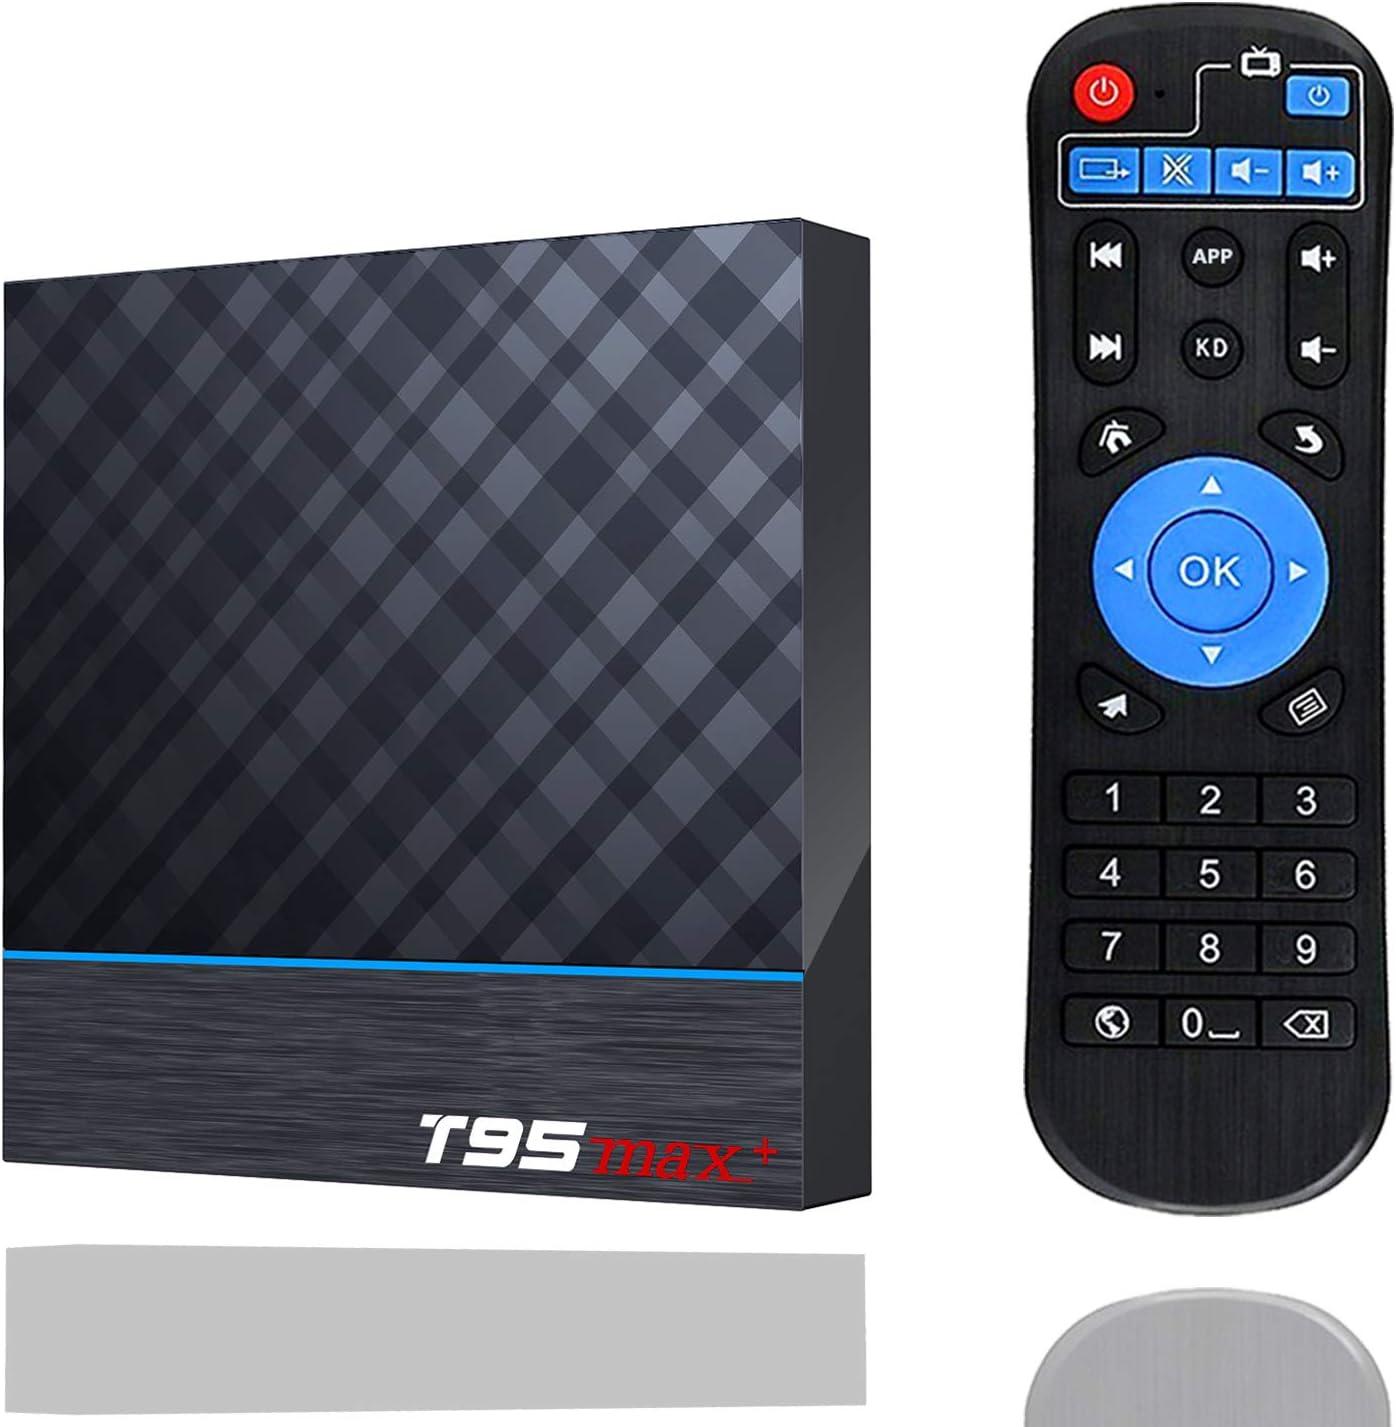 Android TV Box, EVANPO Android 9.0 TV Box 4GB / 64GB Amlogic S905X3 Quad-core Cortex-A55 Bluetooth 4.1, 8K Resolution H.265 2.4GHz&5GHz Dual Band WiFi Smart Box Media Player Set Top Box